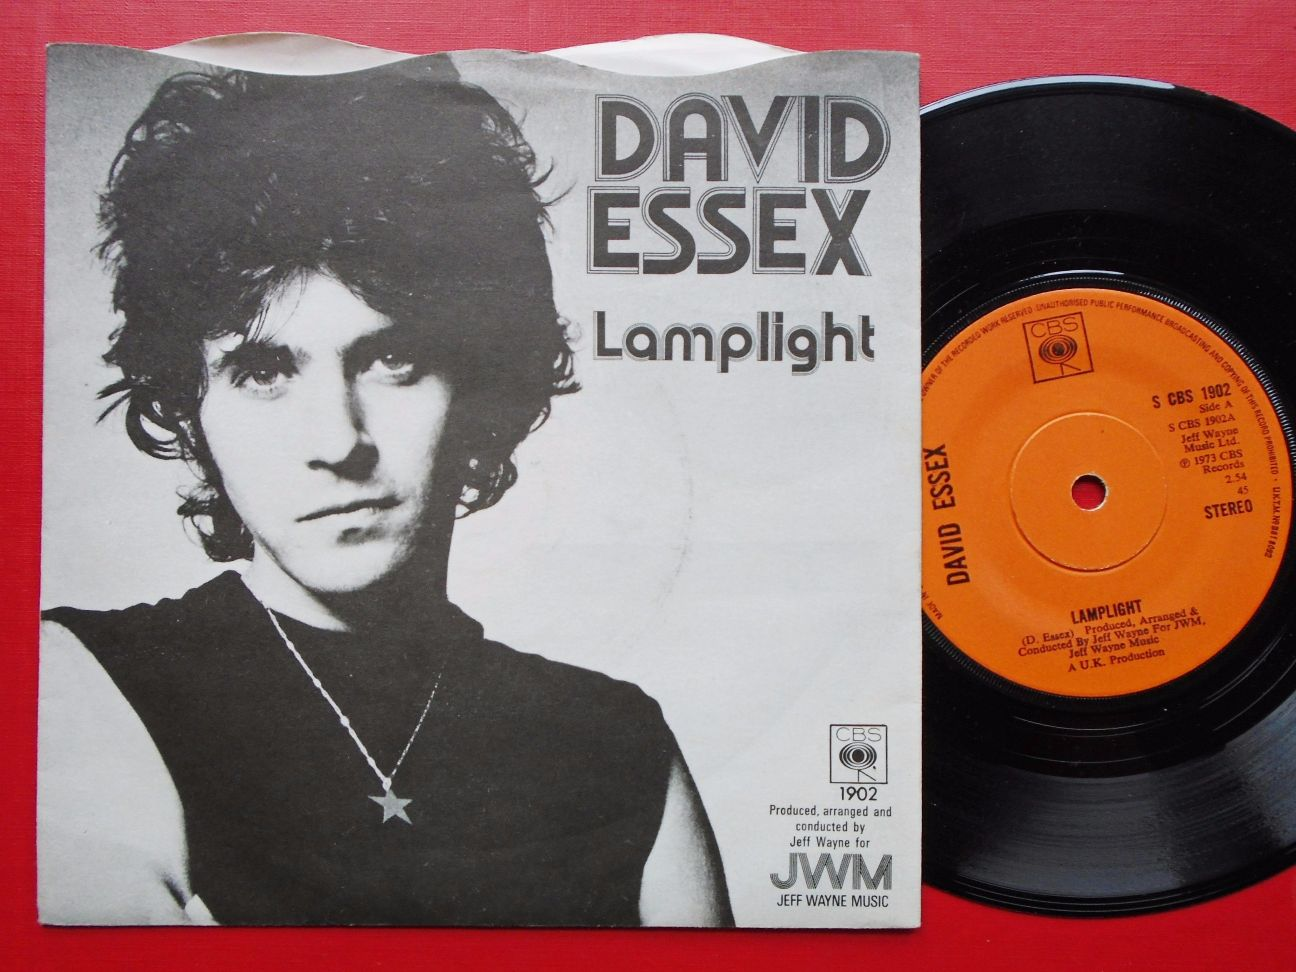 David Essex Lamplight/We All Insane